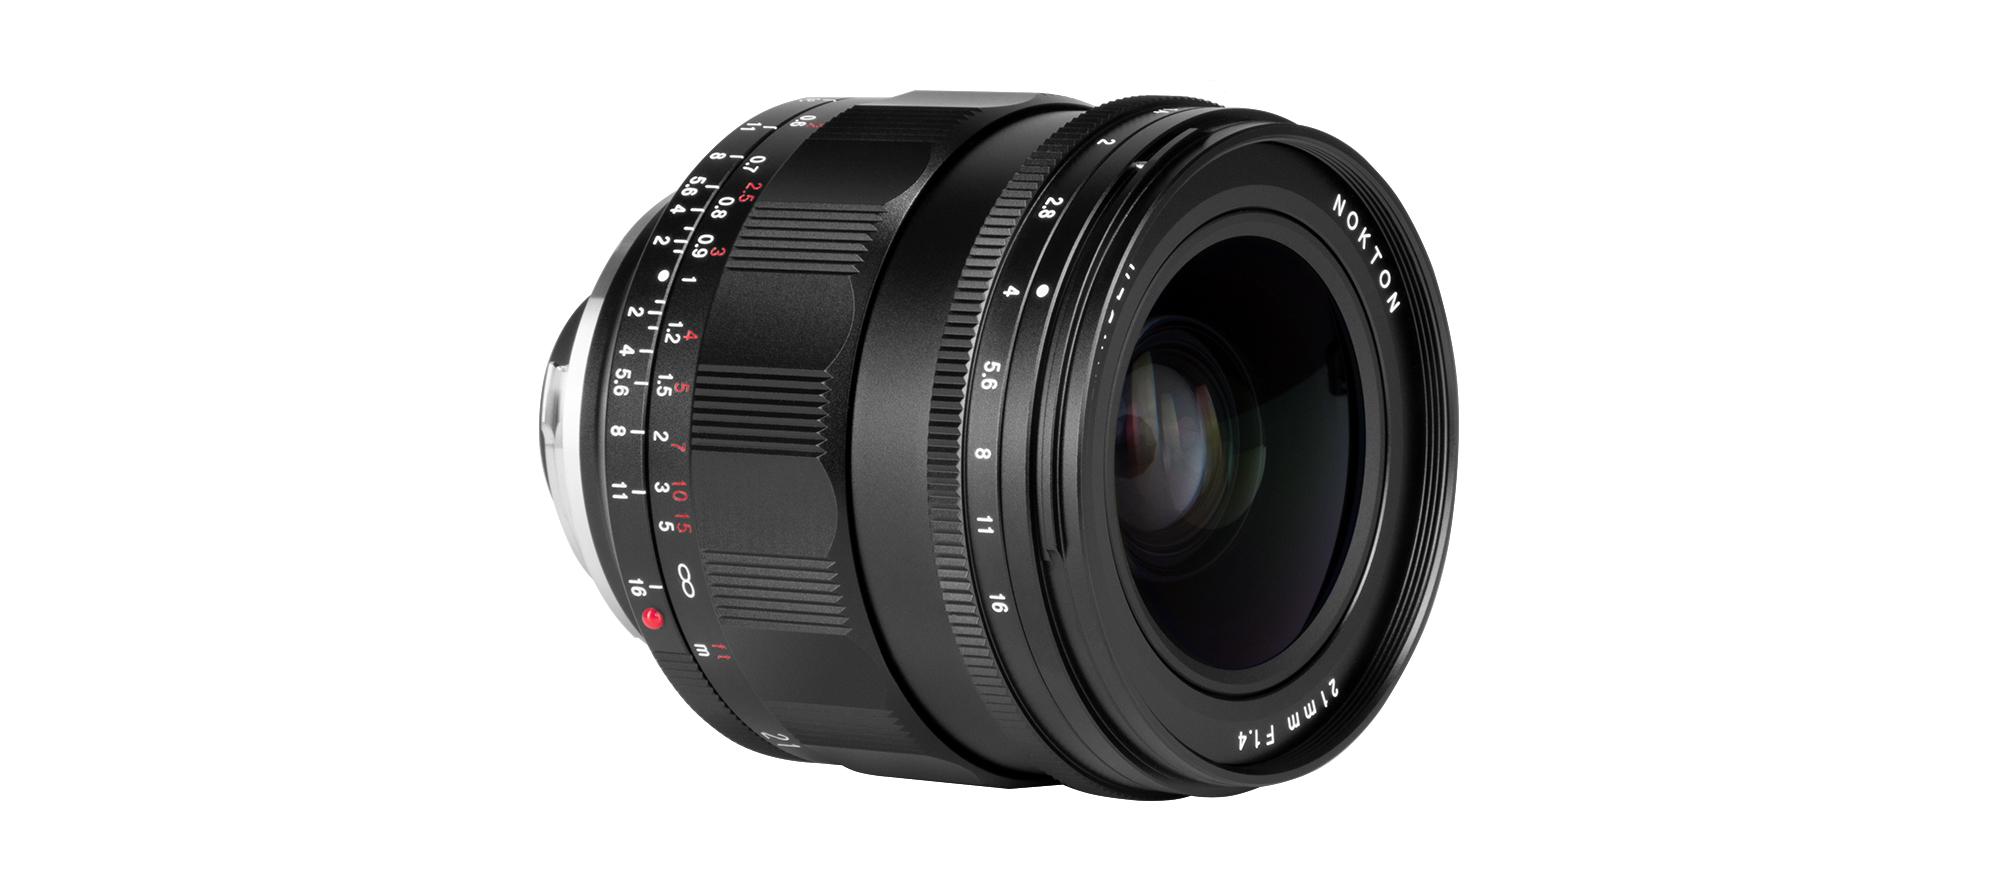 Voigtlander Nokton 21 mm f/1.4 Leica M mount lens seen from the side